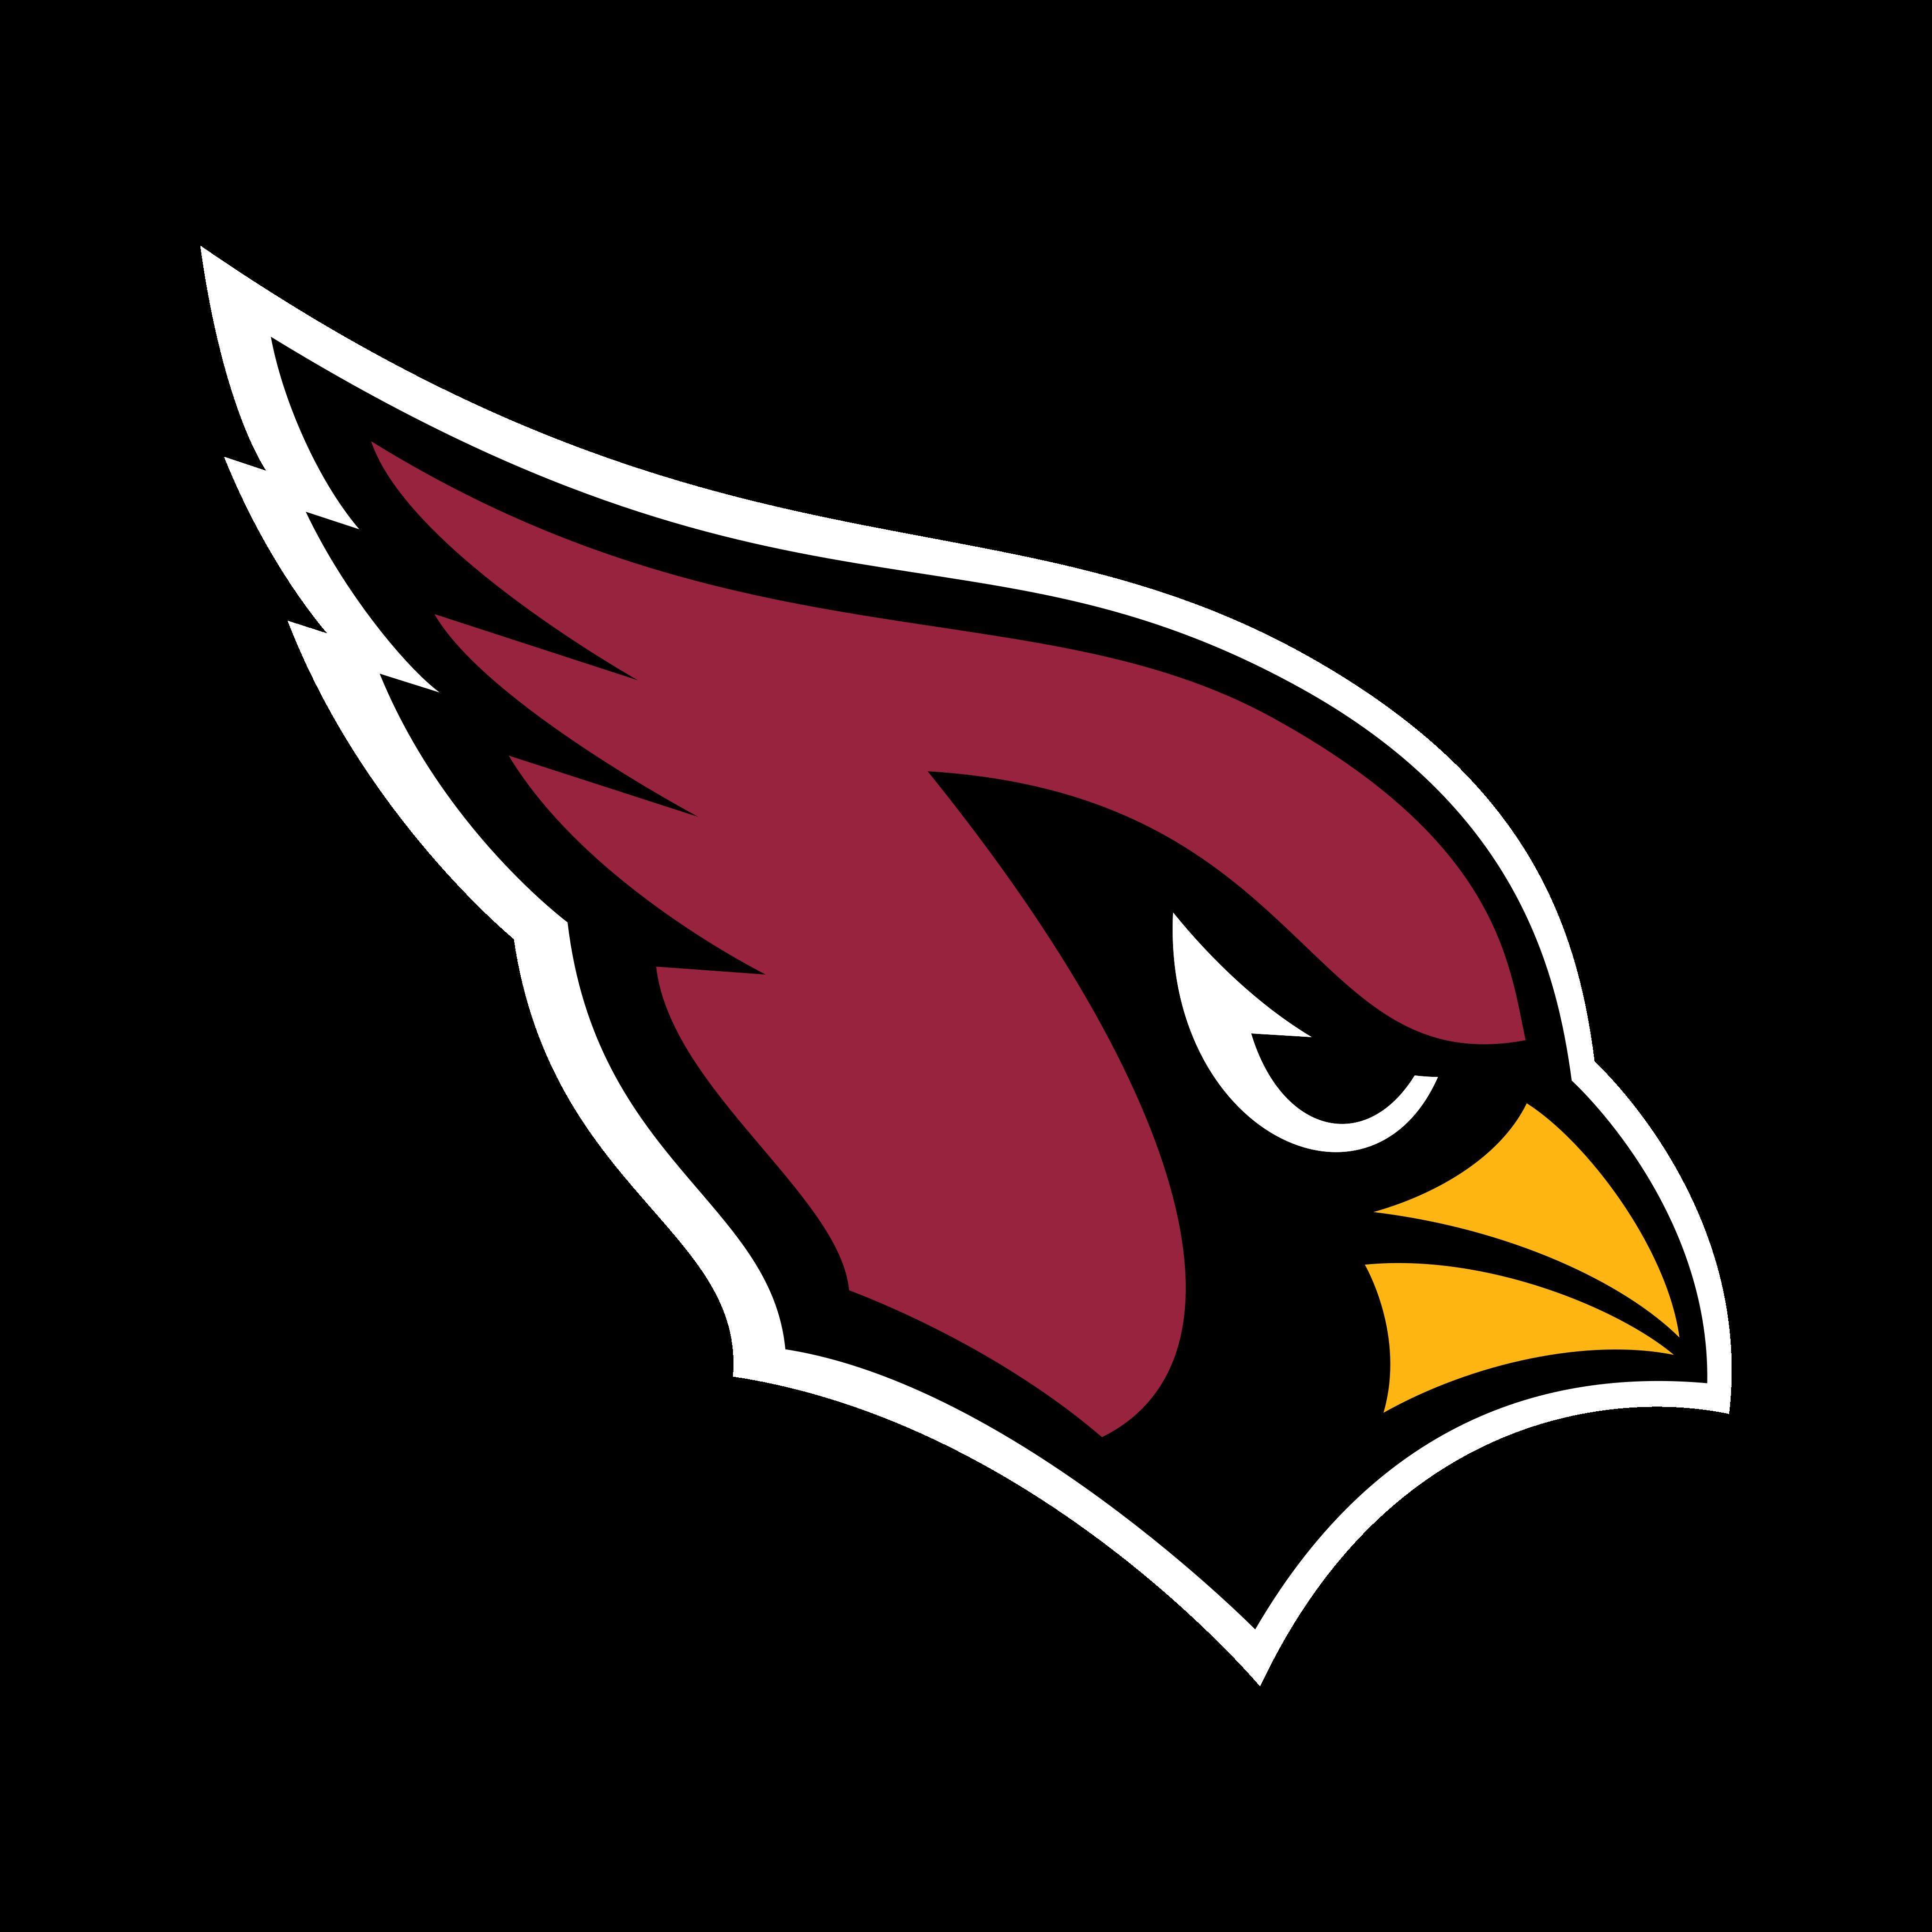 arizona cardinals logo 0 - Arizona Cardinals Logo